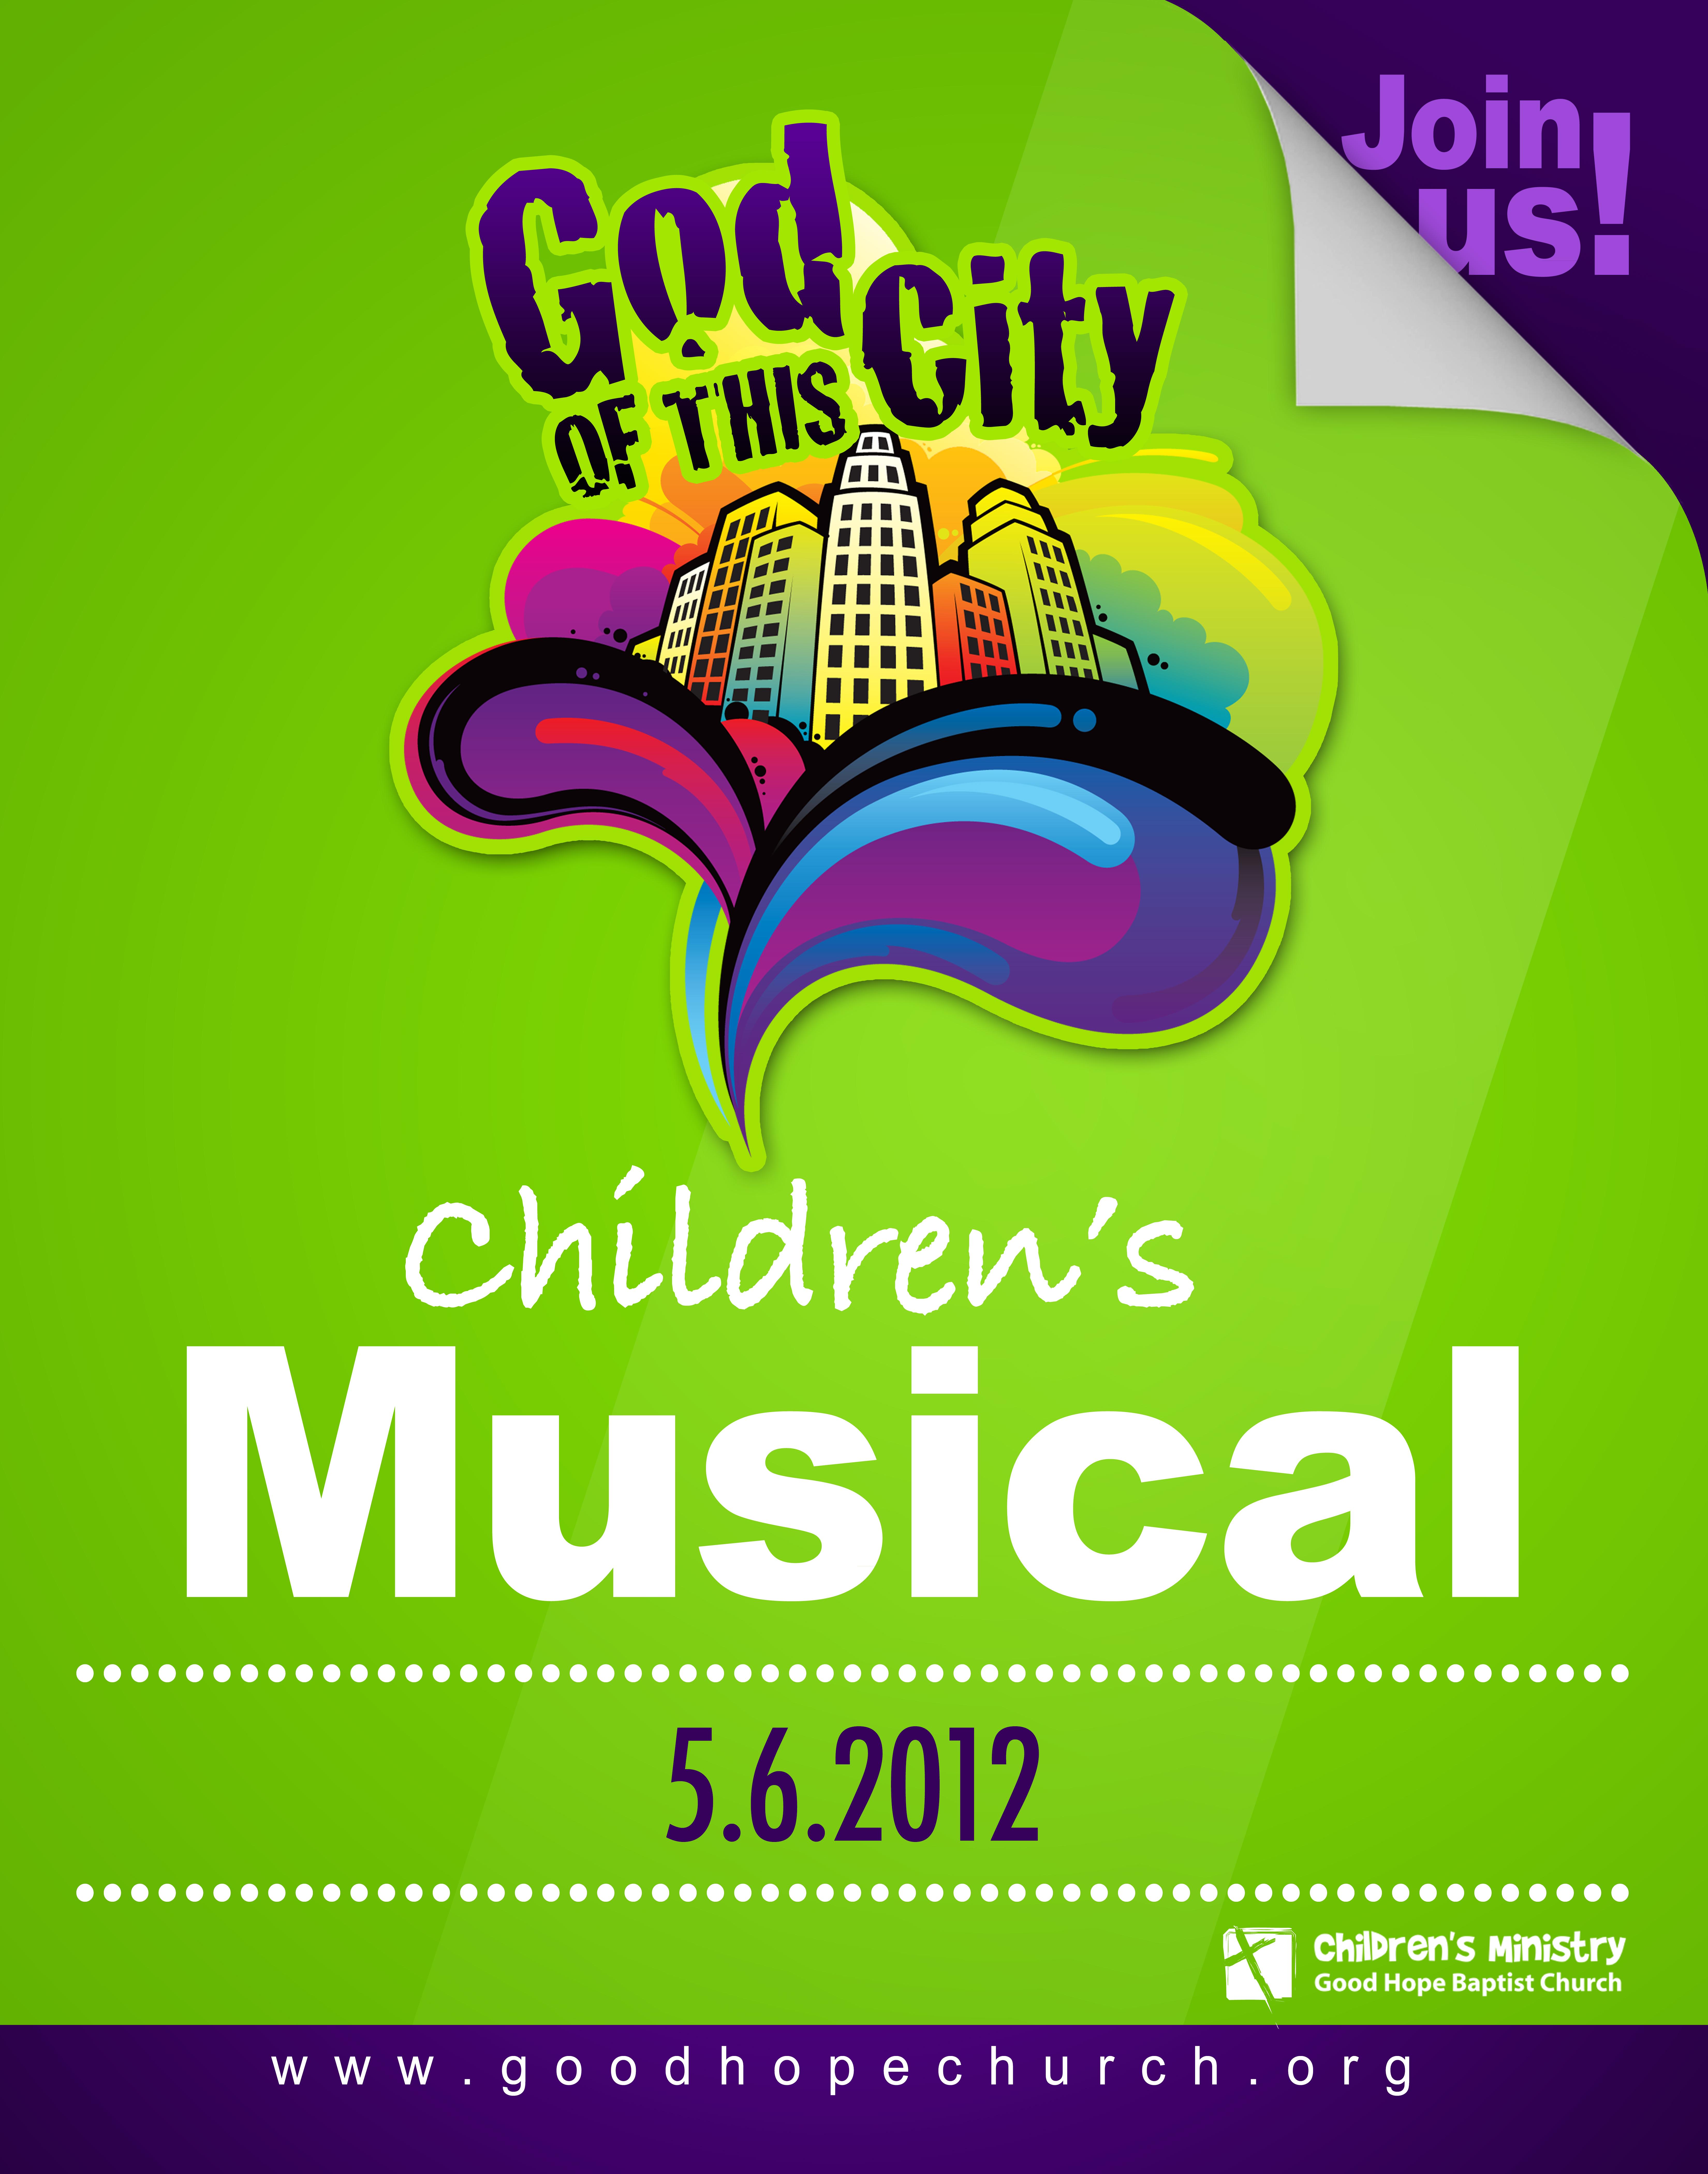 ghbc_god-of-this-city